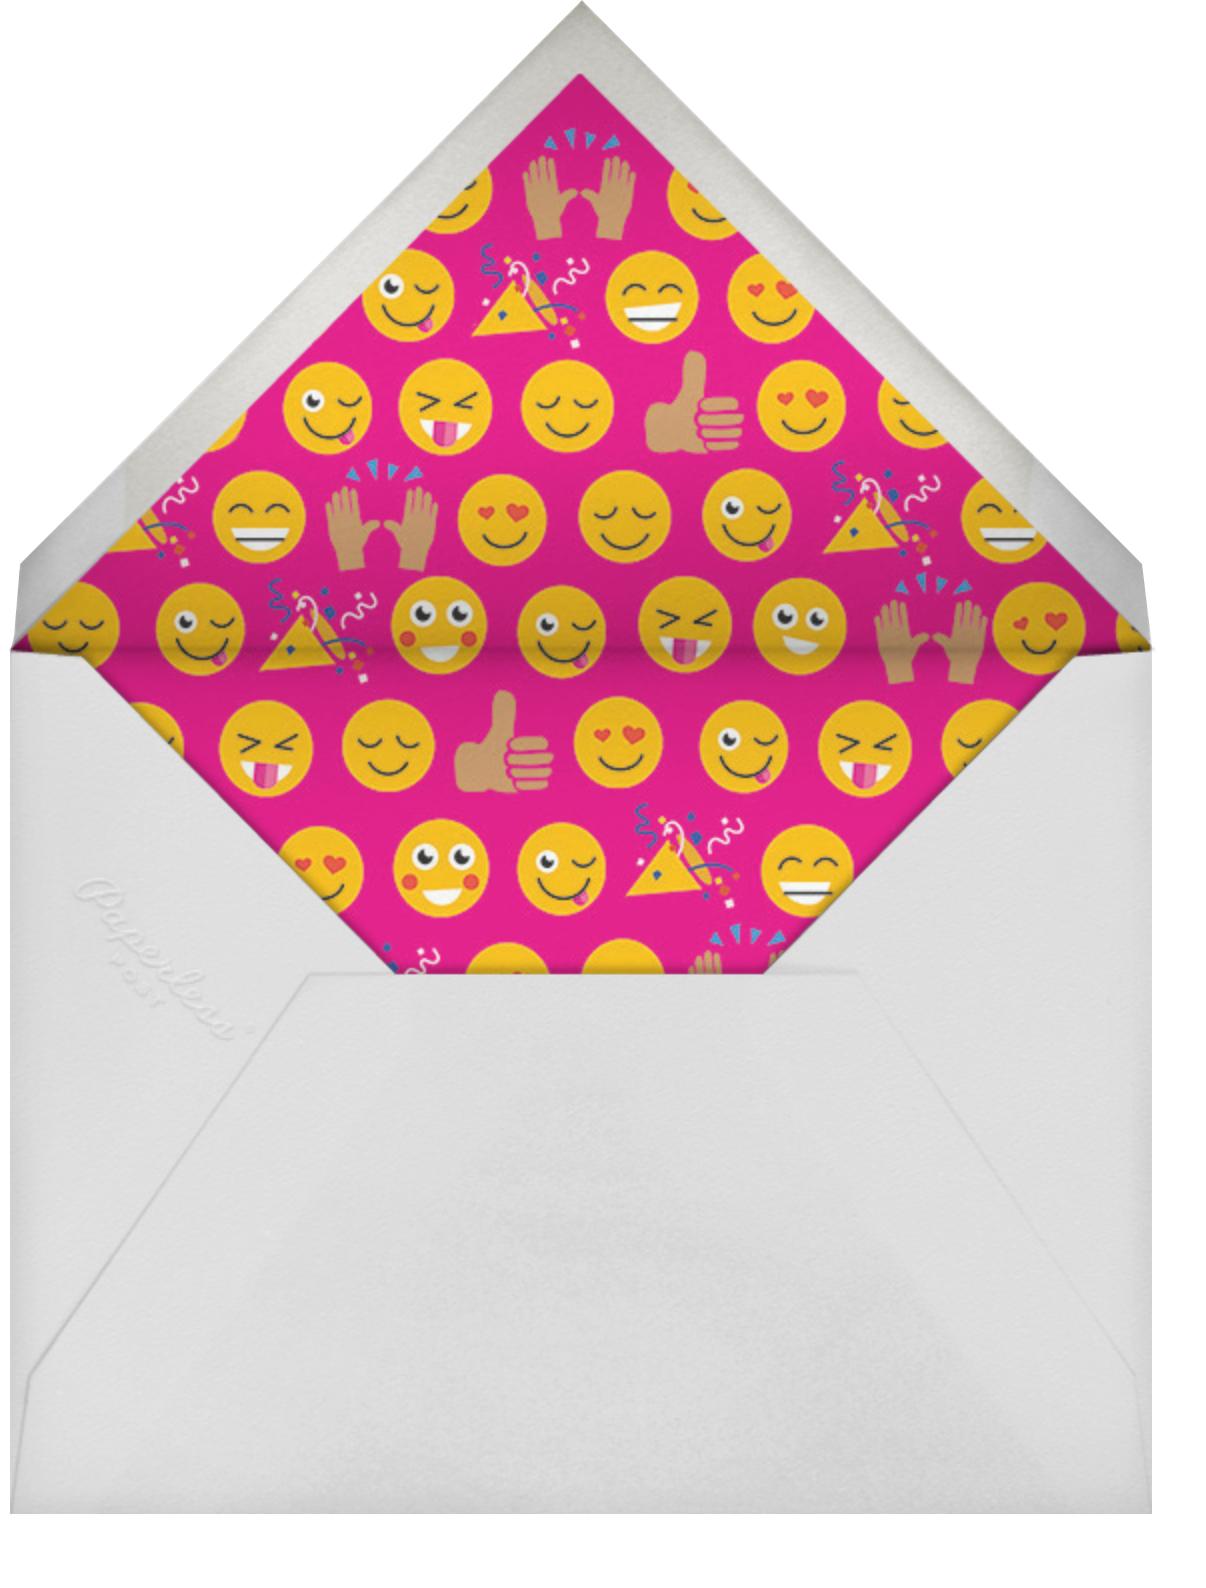 Partymojis - Medium - Cheree Berry Paper & Design - Kids' birthday - envelope back